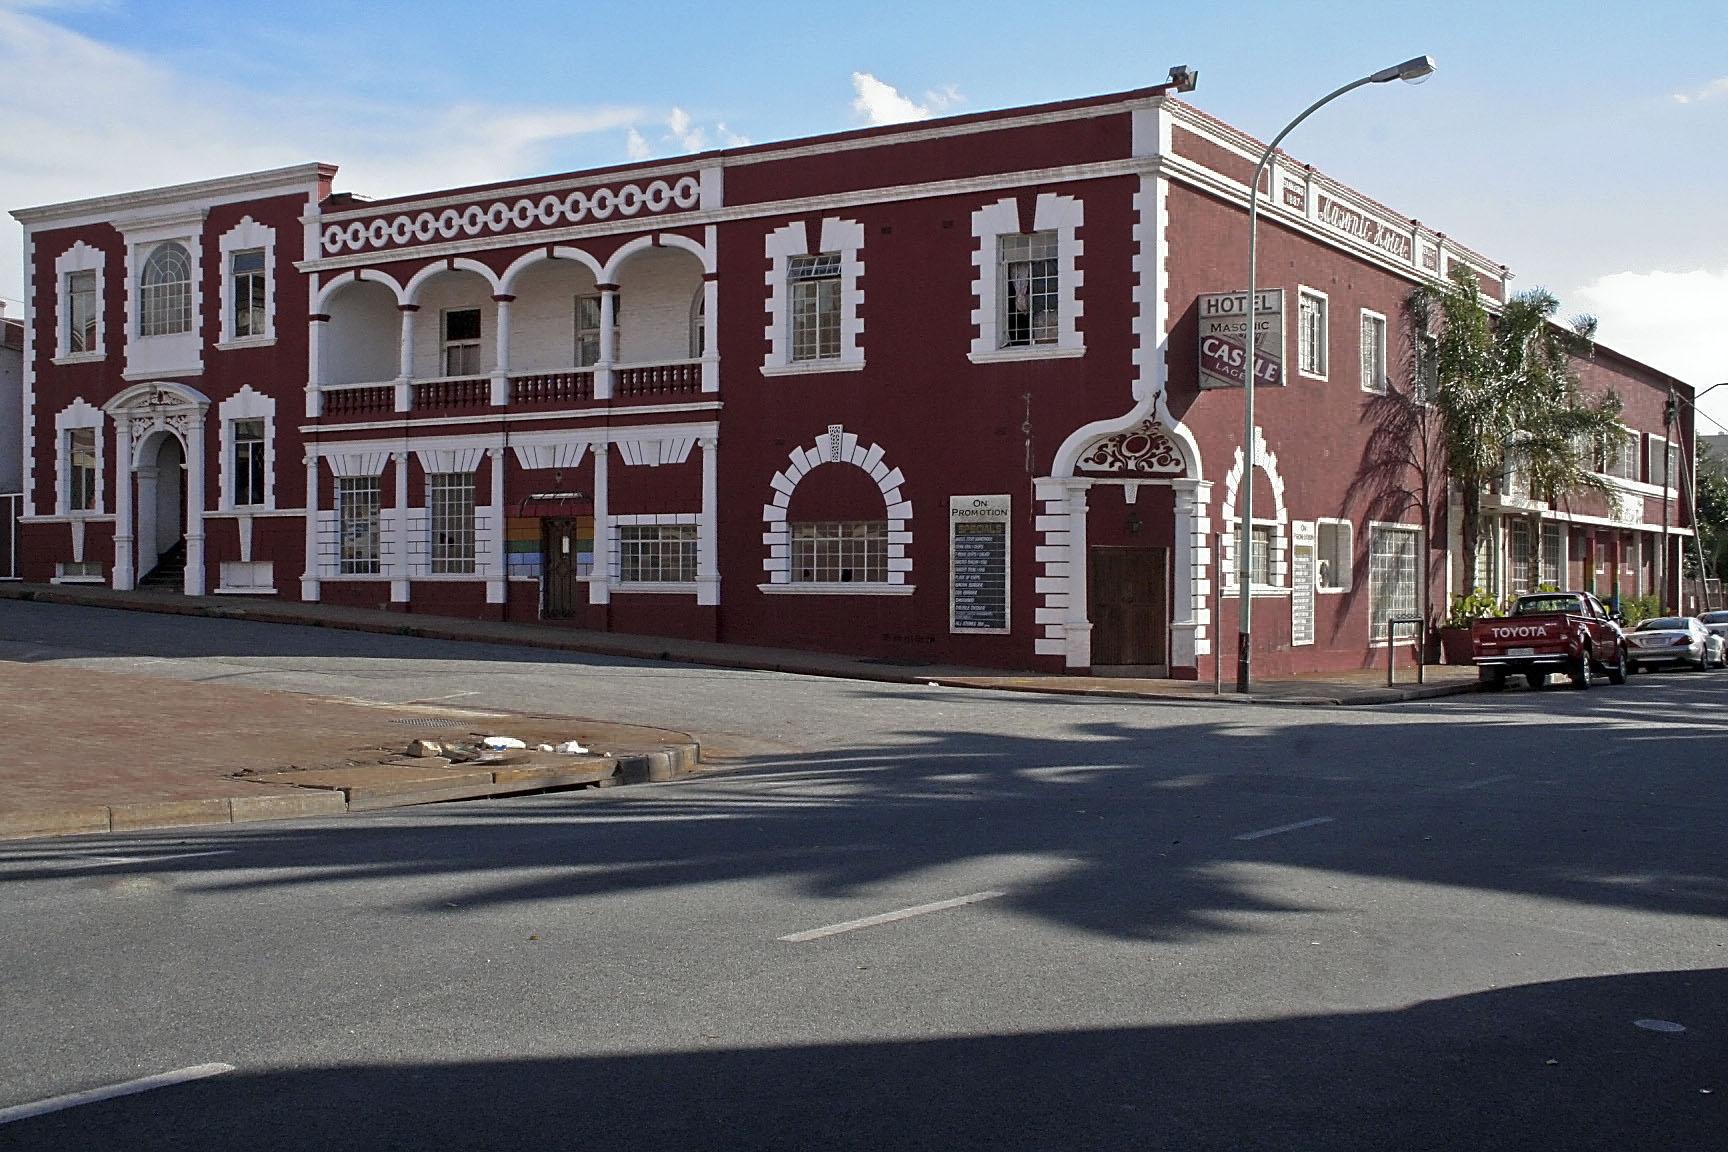 Boksburg motel